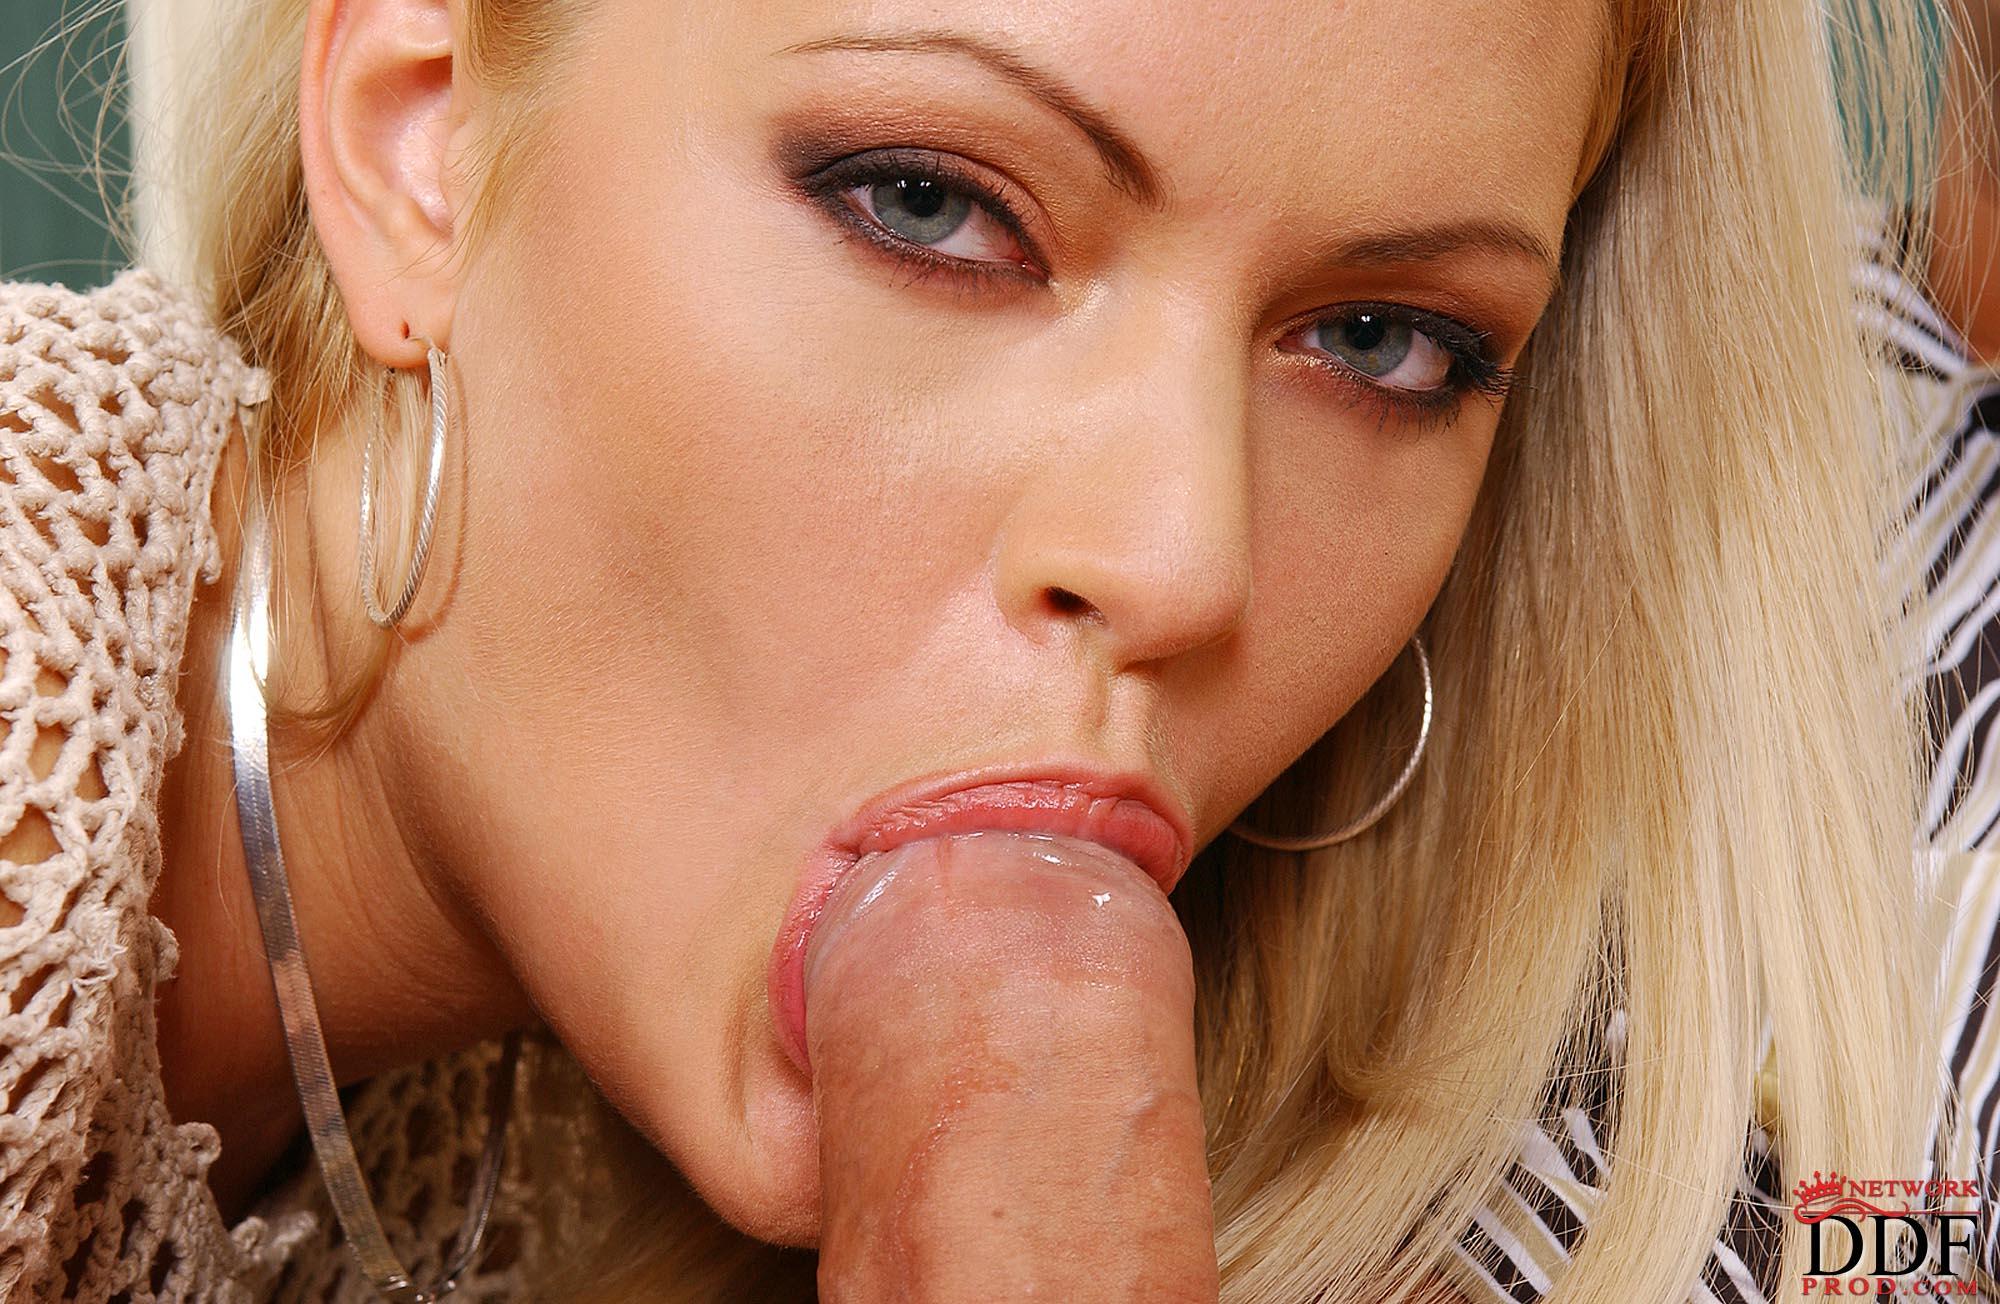 sexvideo smith Anna nichole